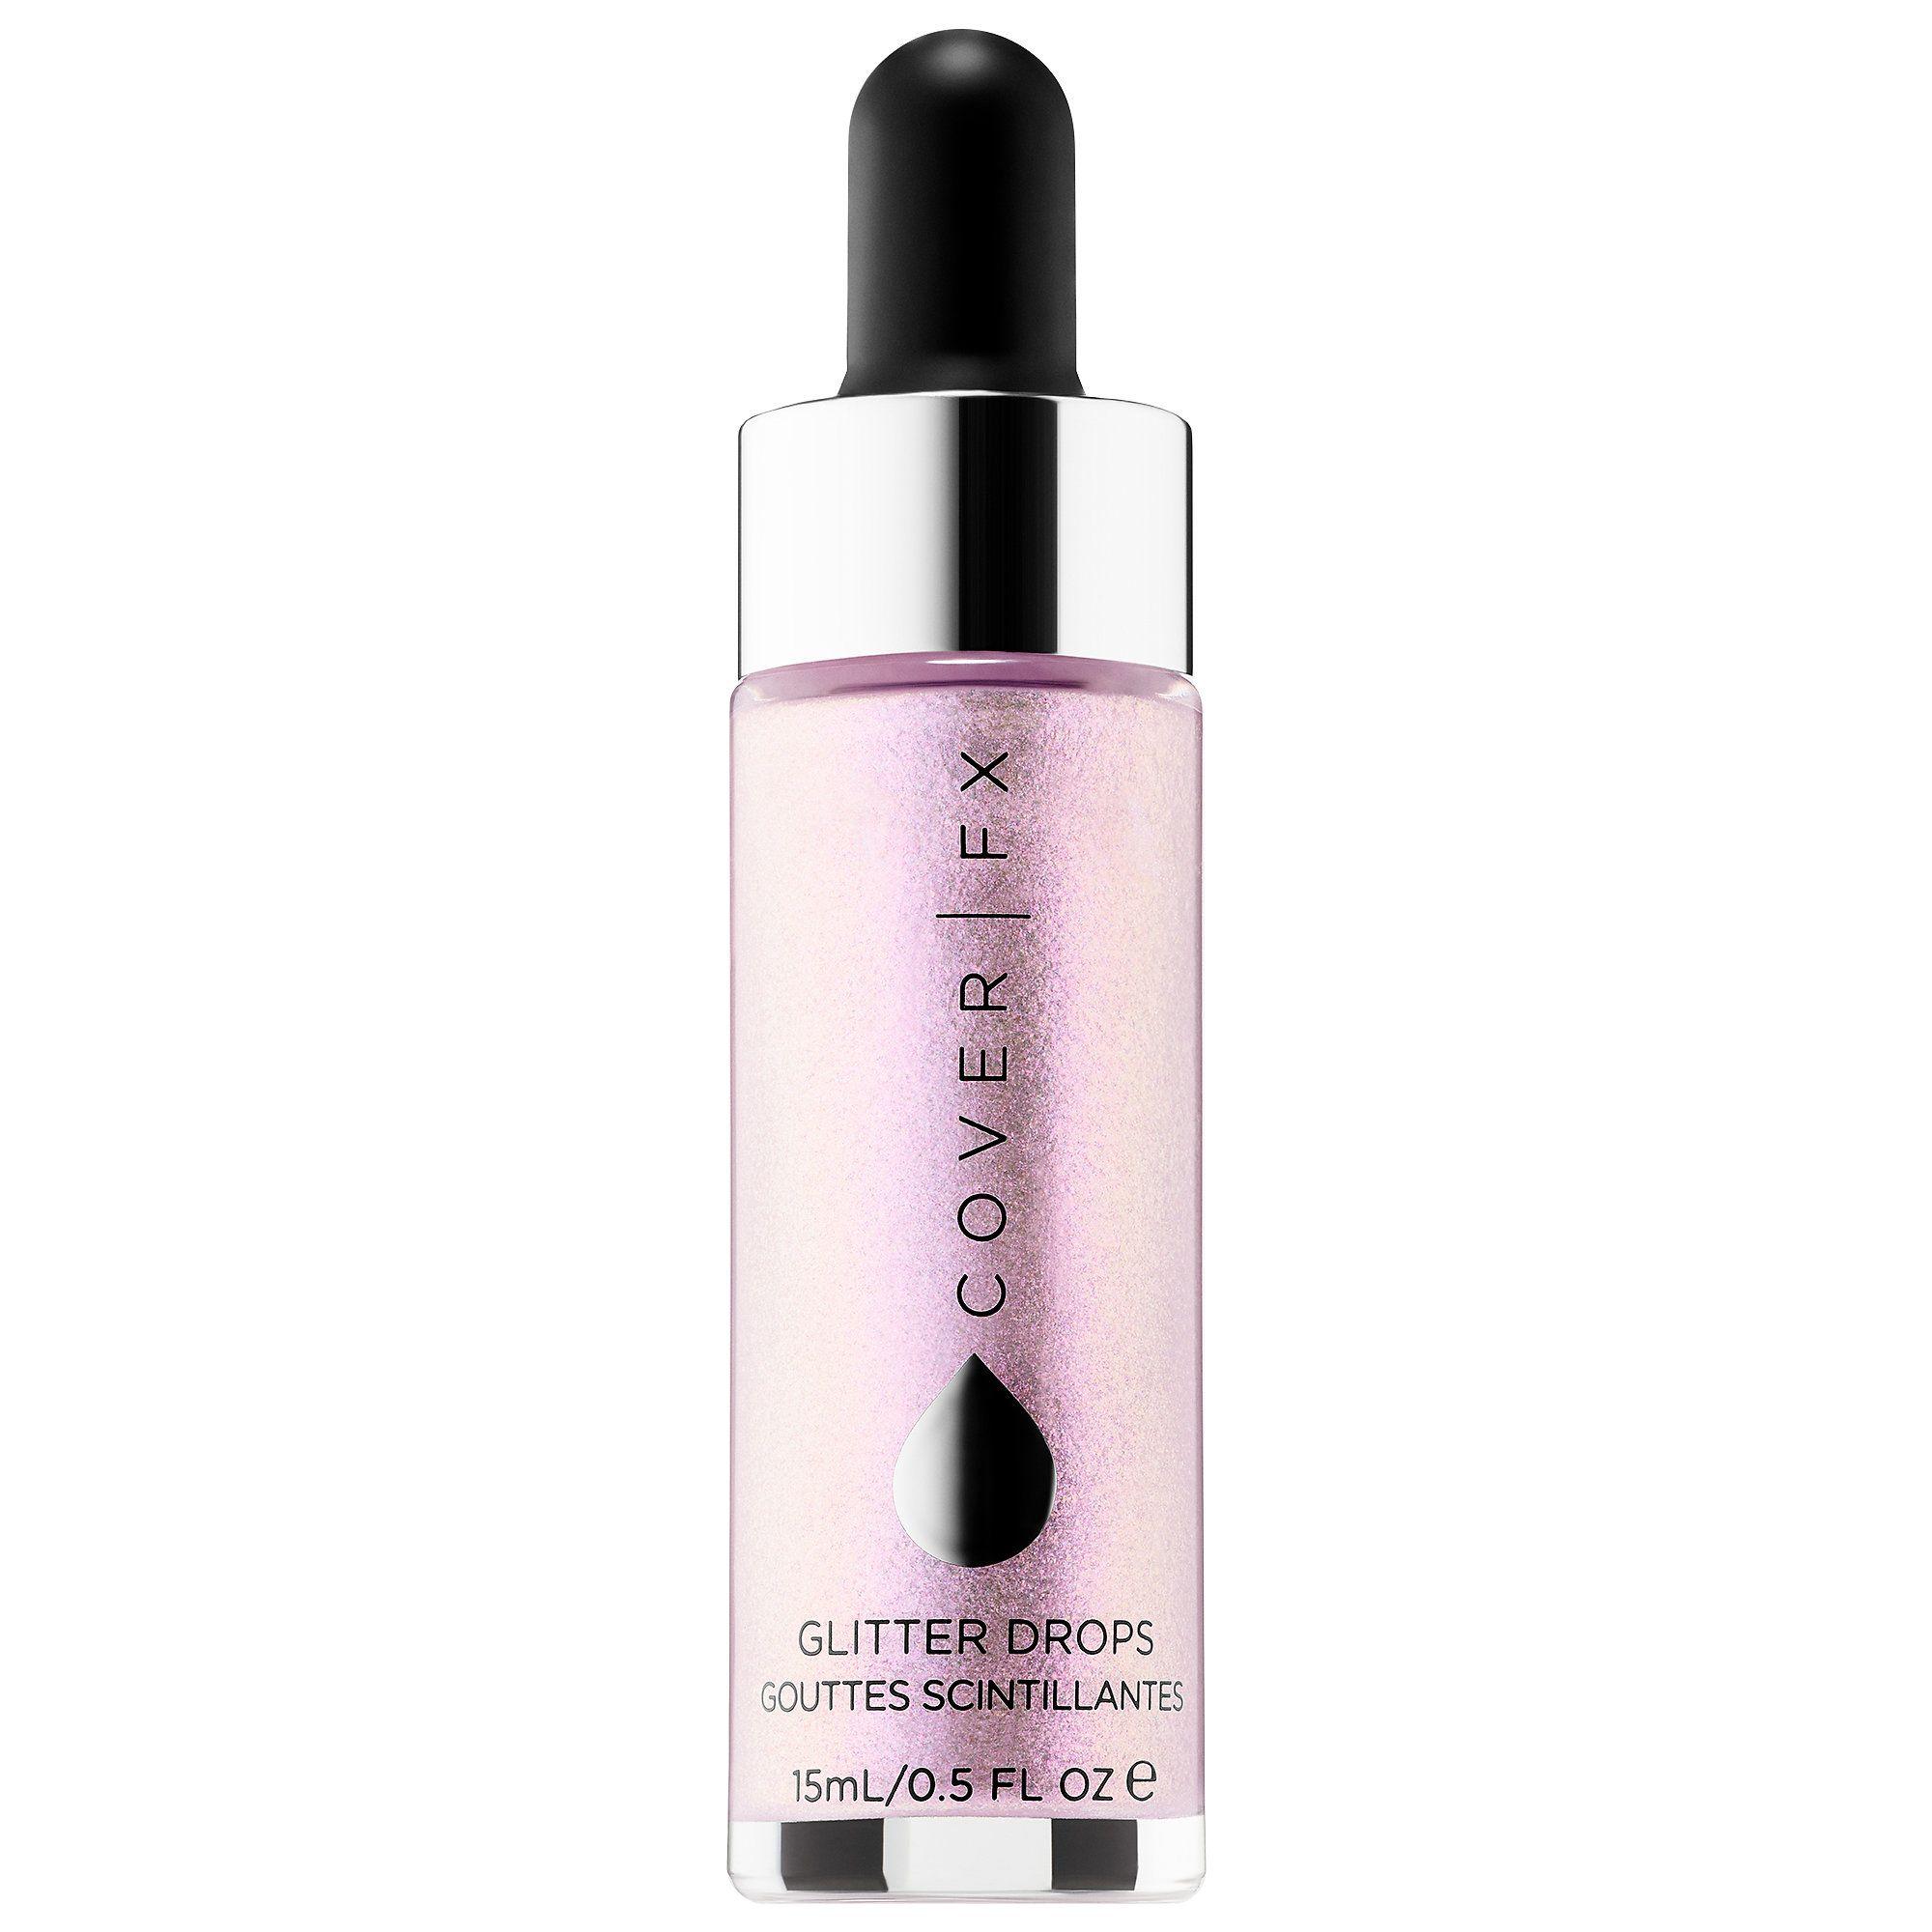 Glitter Drops Cover fx, Hourglass makeup, Sephora